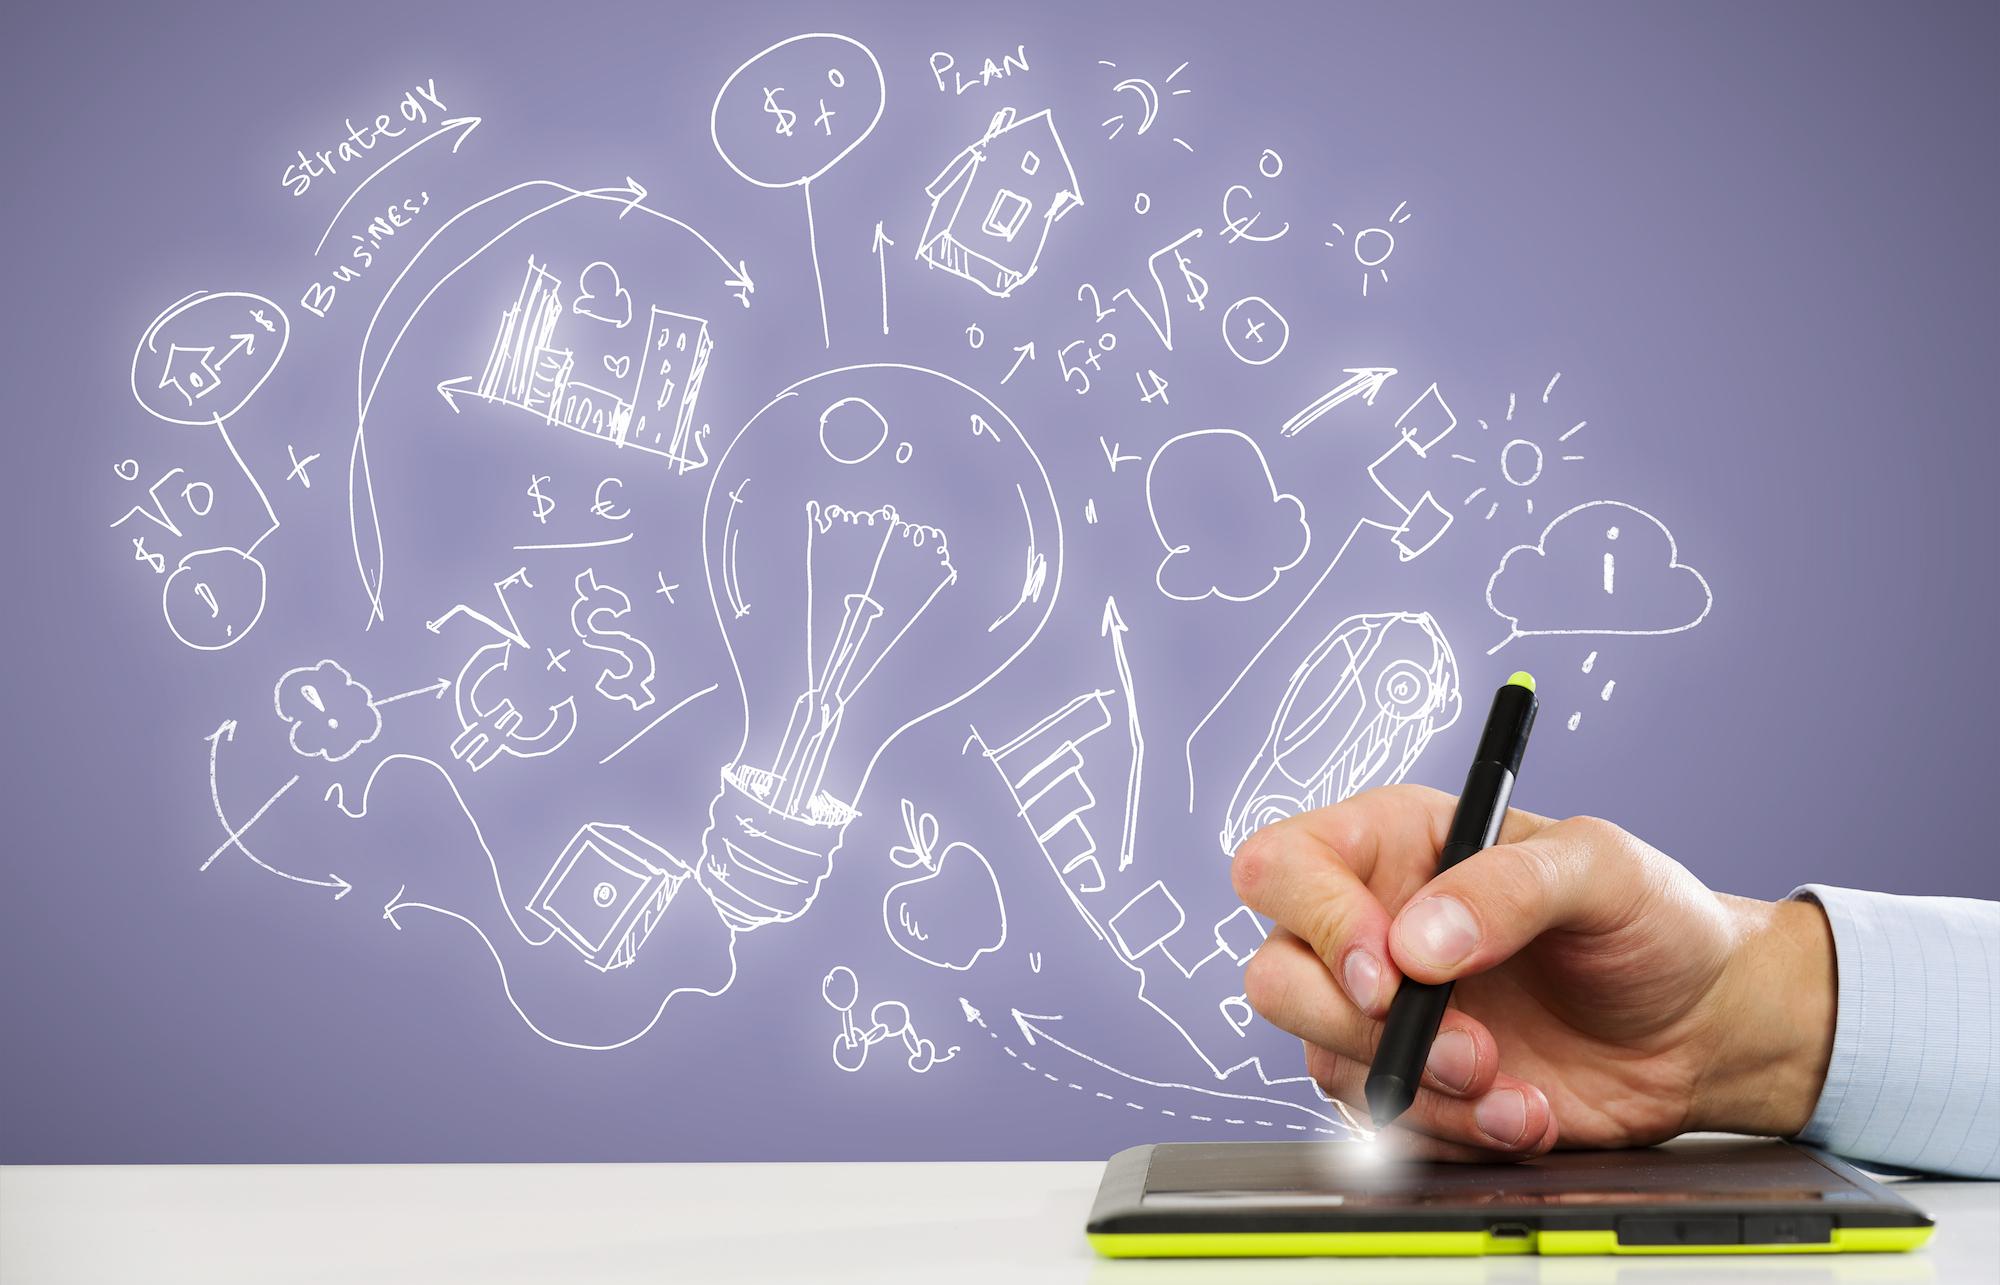 brainstorm-business-strategy.jpg